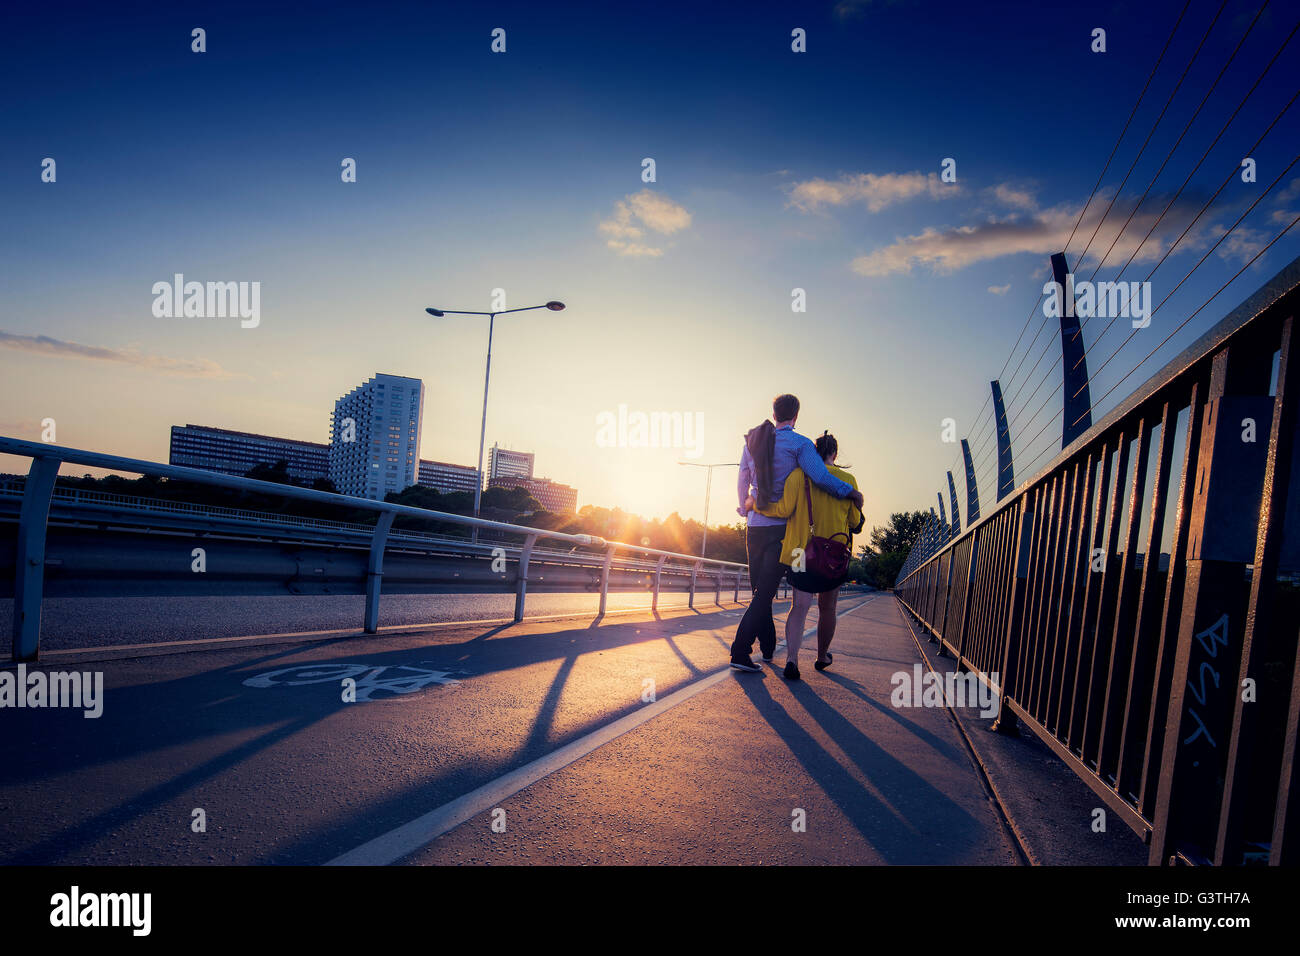 Sweden, Stockholm, Couple walking on bridge - Stock Image